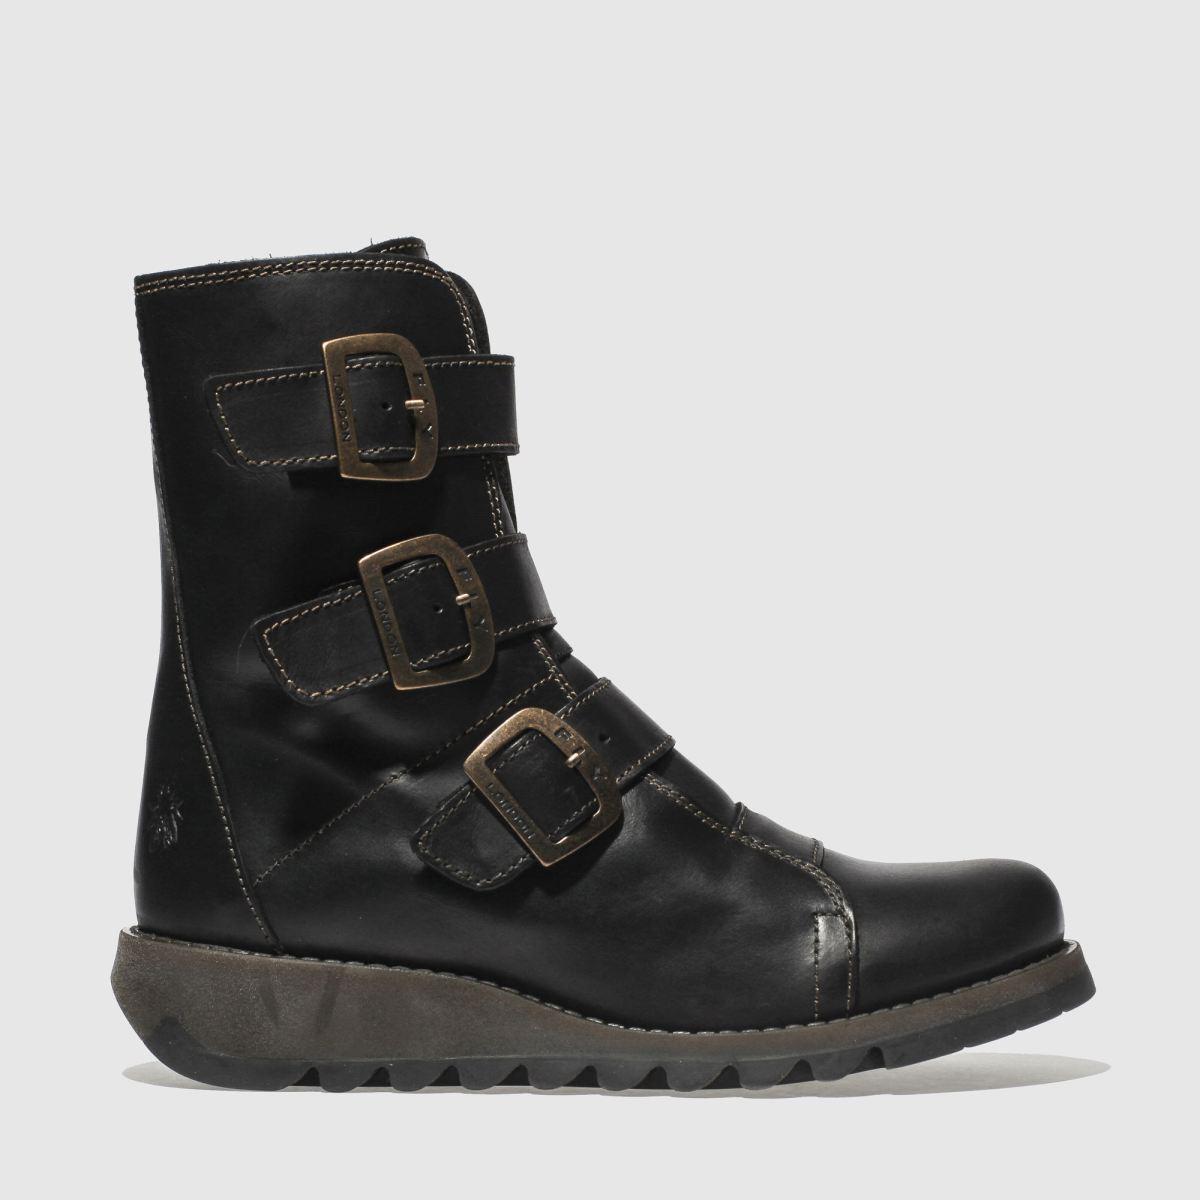 Fly London Black Scop Boots